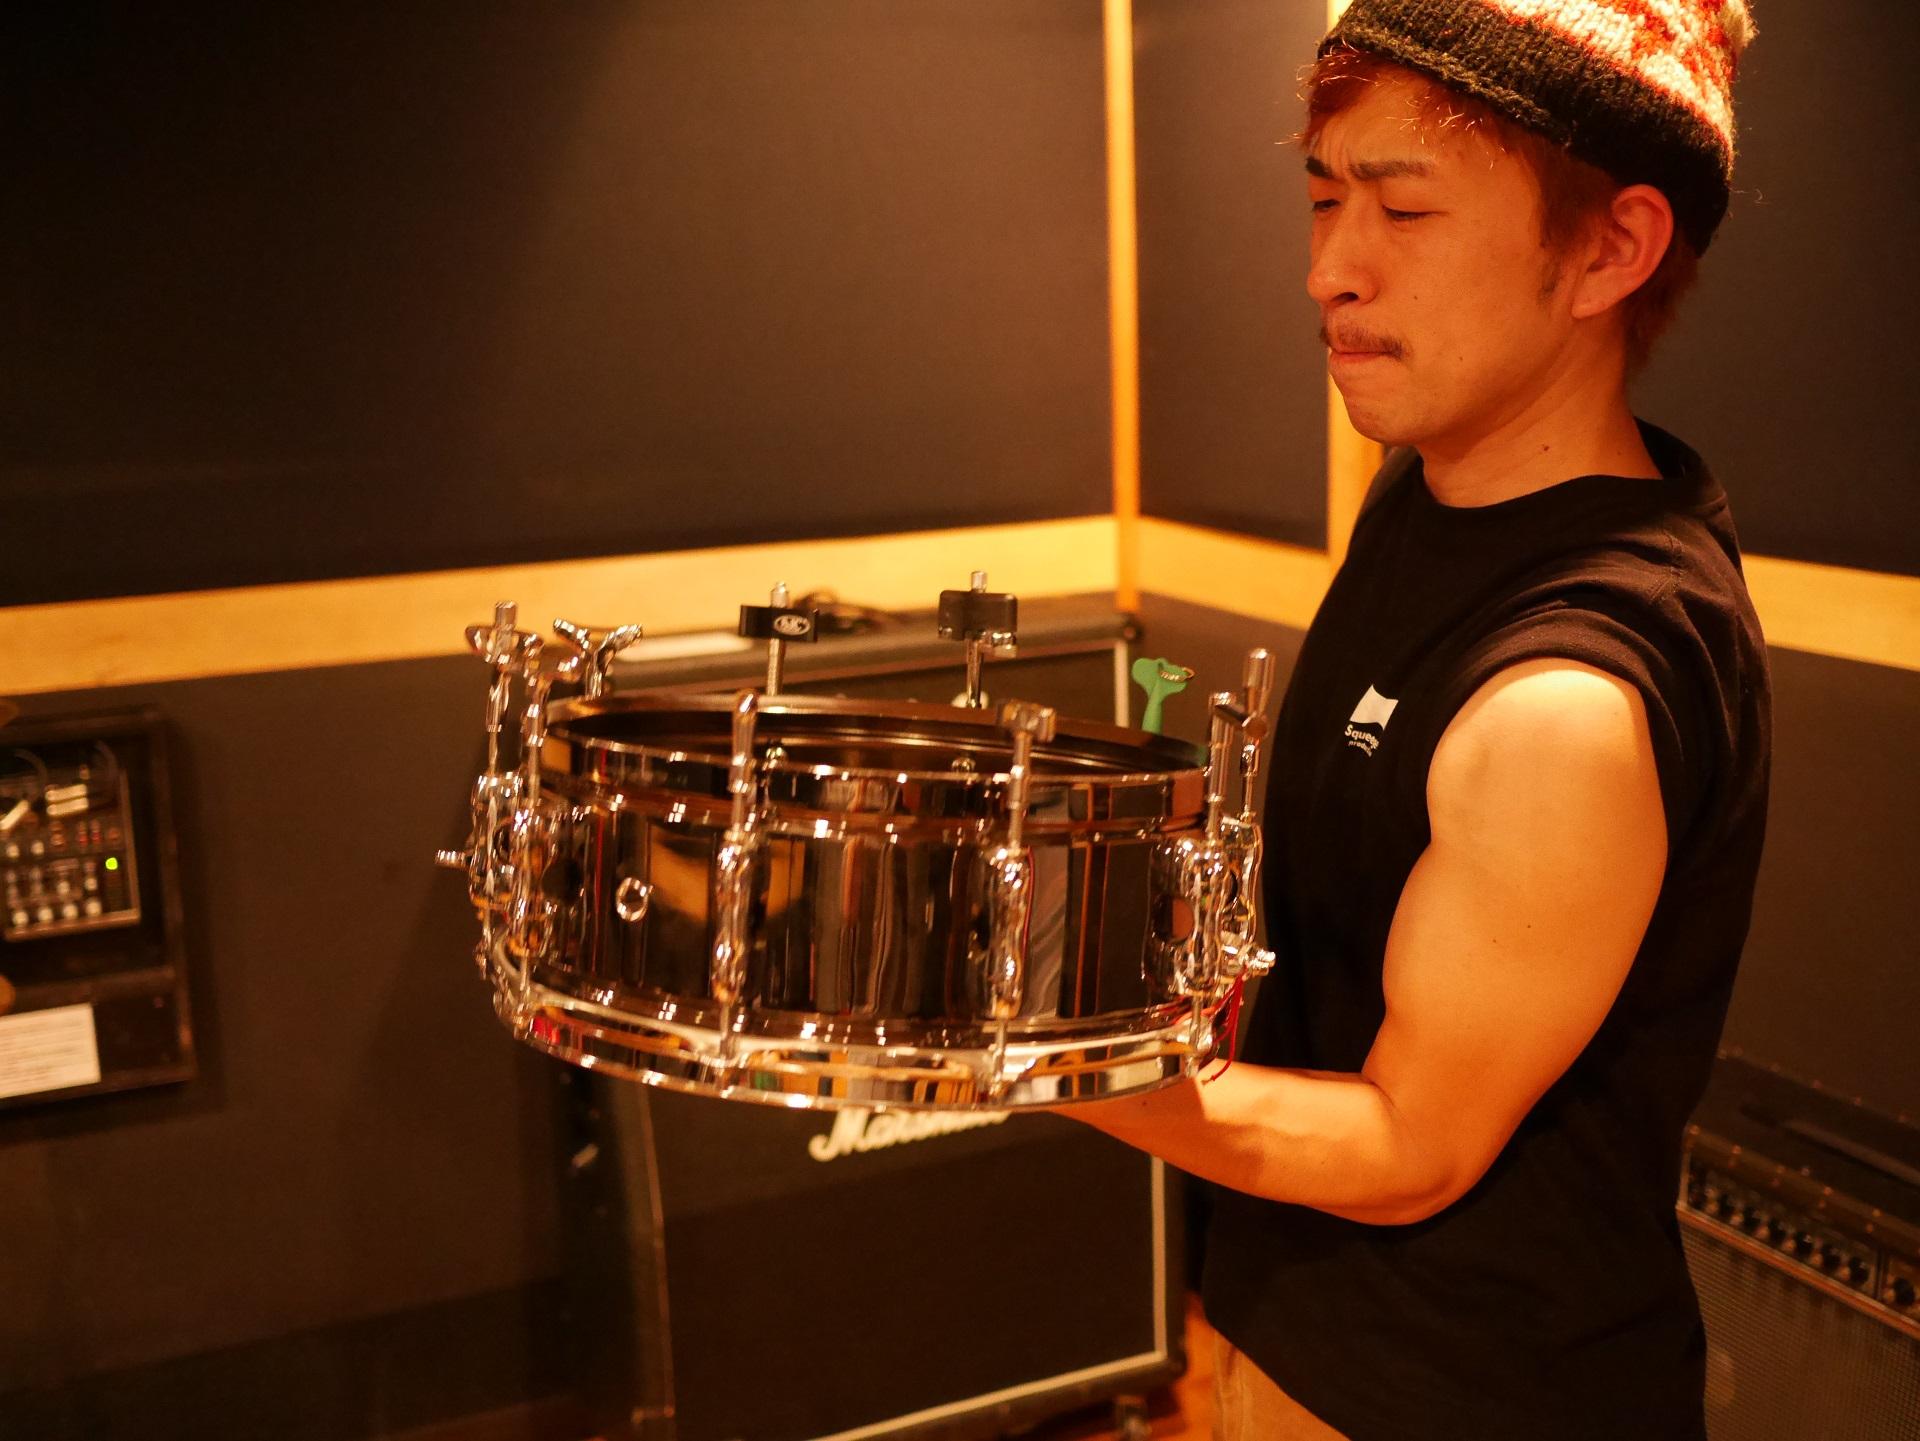 【4+64+9=D/RUM 合同企画】最速チューニングキーを探せ!  Drummer 勝本 浩史(parock86)